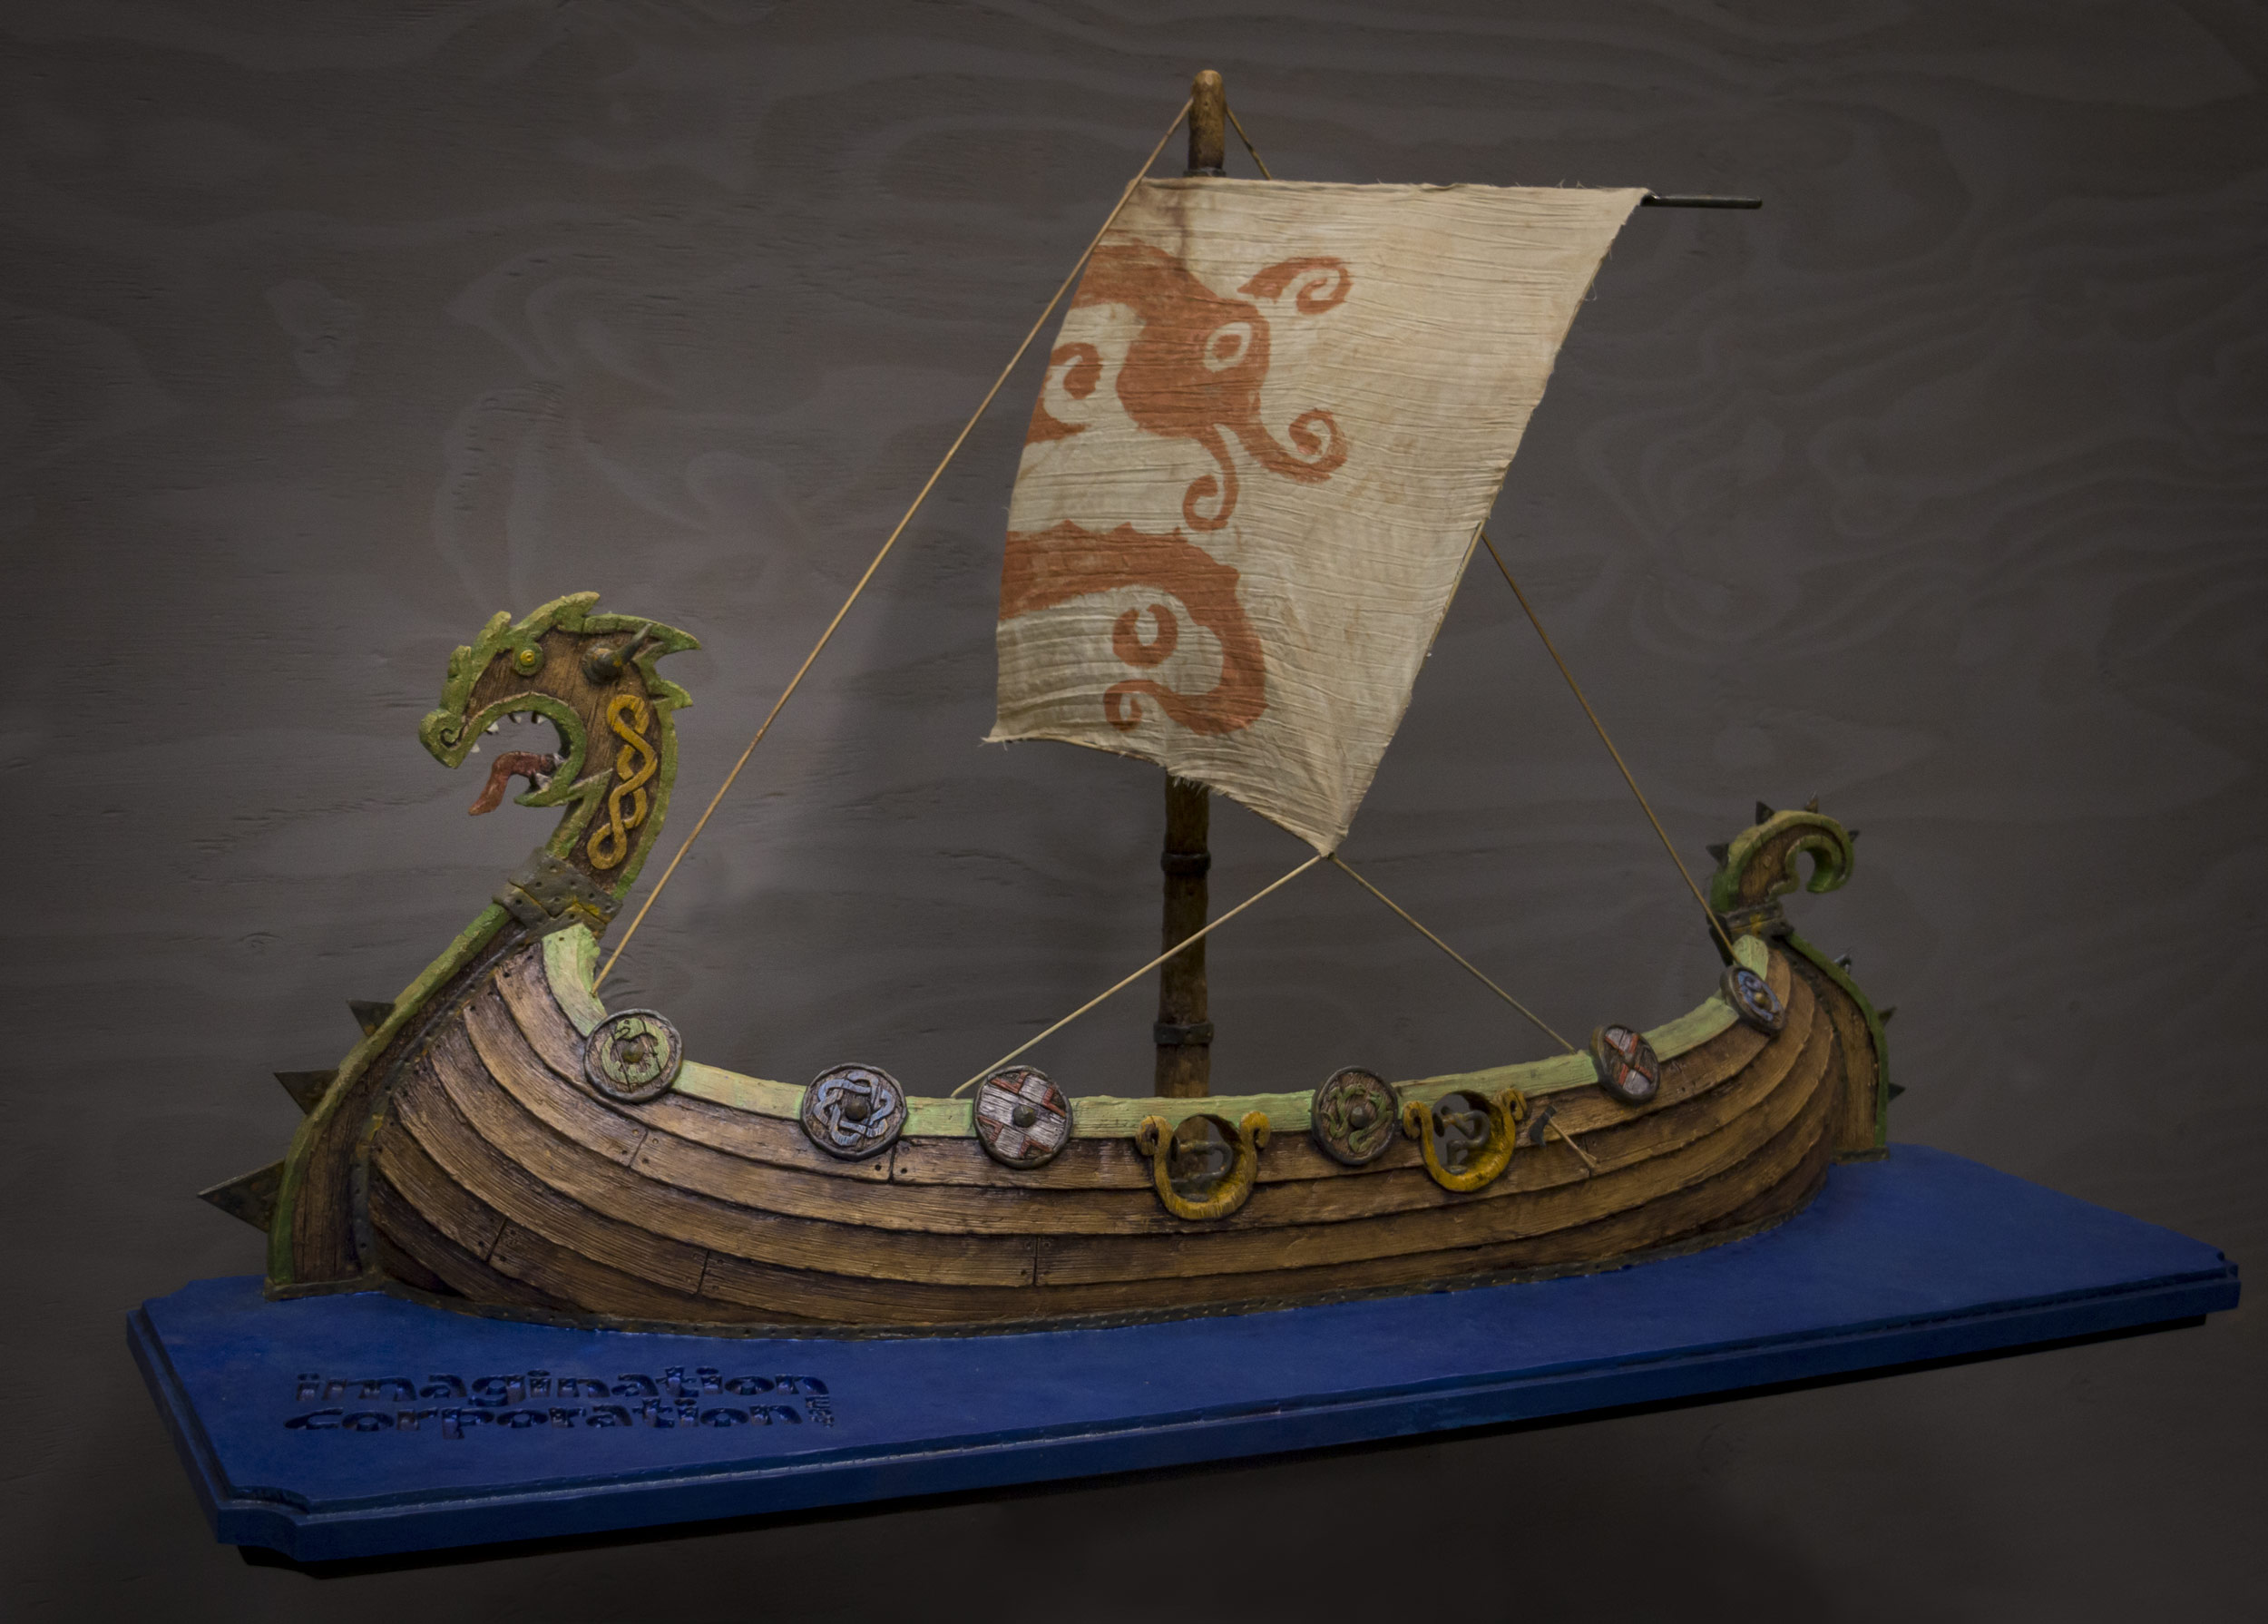 viking-ship-model-1.jpg